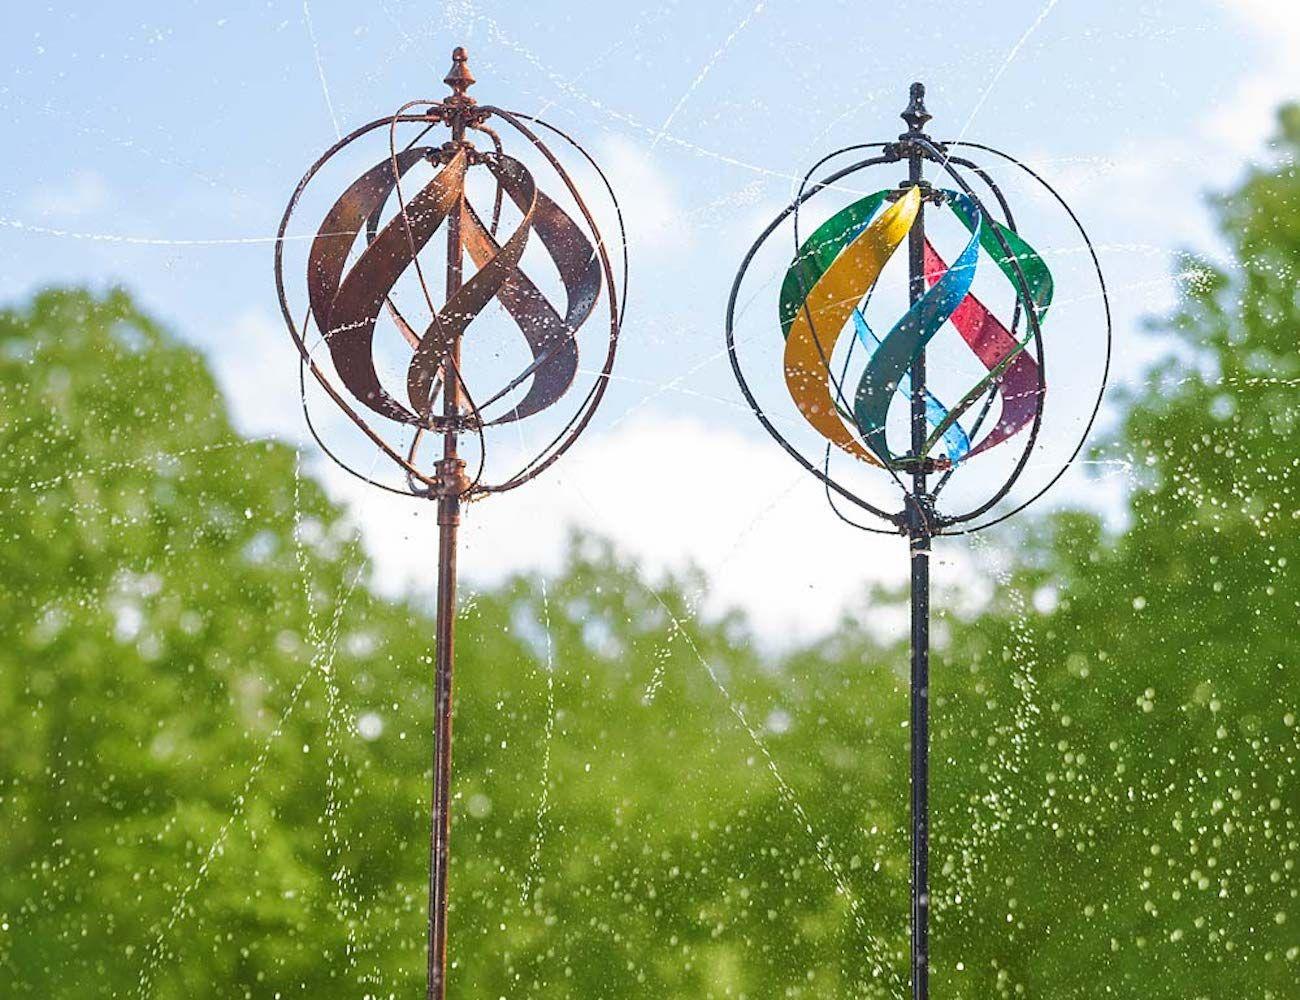 Hydro Ball Garden Wind Spinner Wind Spinners Kinetic Wind Spinners Garden Wind Spinners